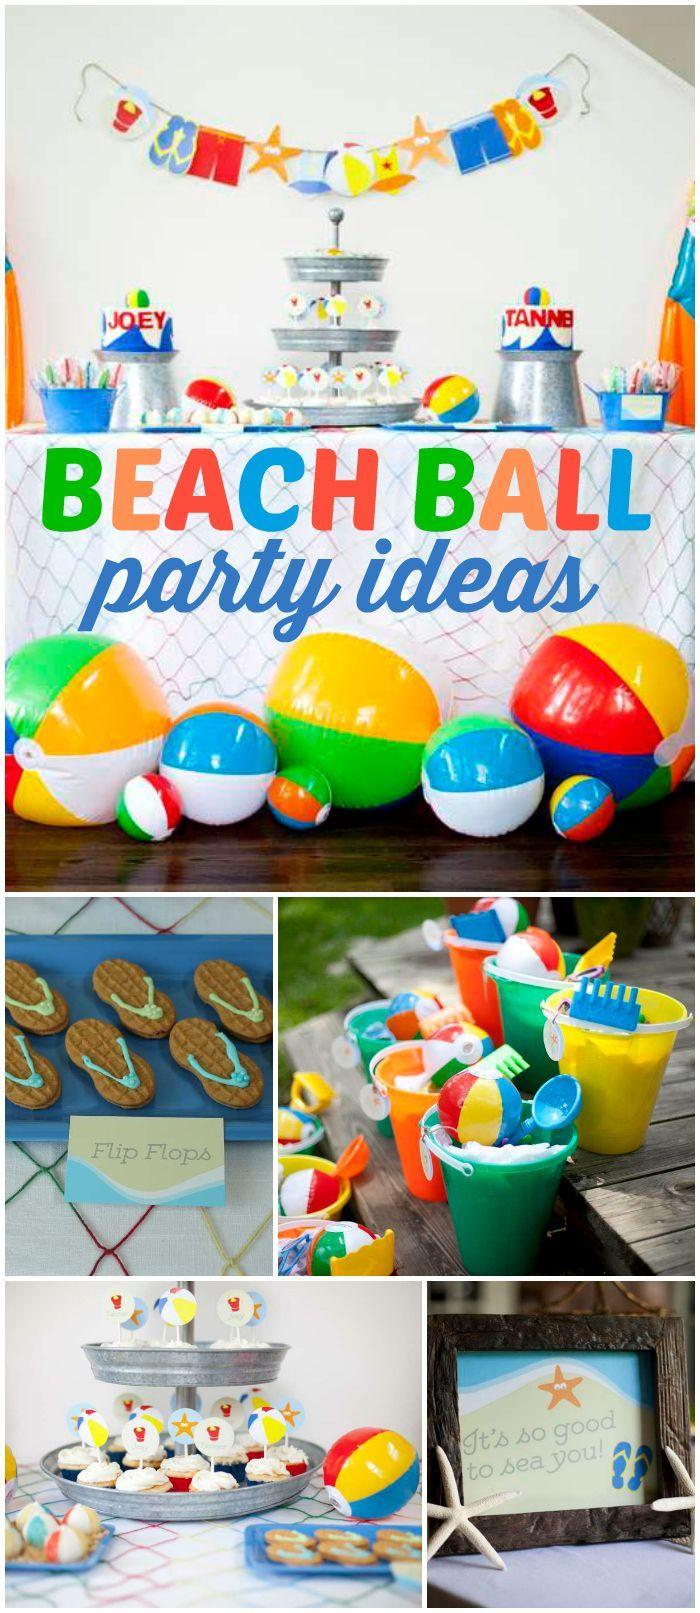 Best Beach Party Ideas  Pin by ArtsyCraftsyMom